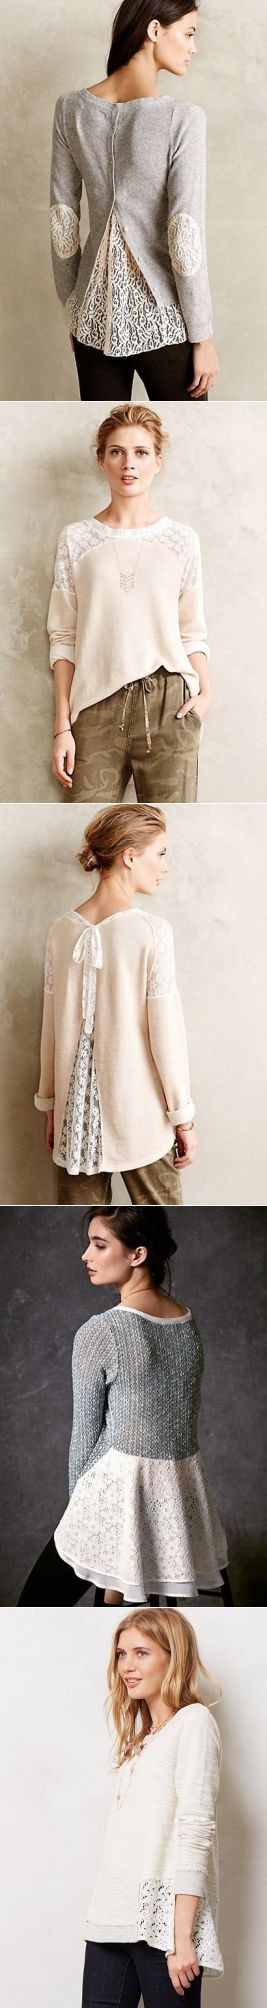 Ideas para renovar suéter